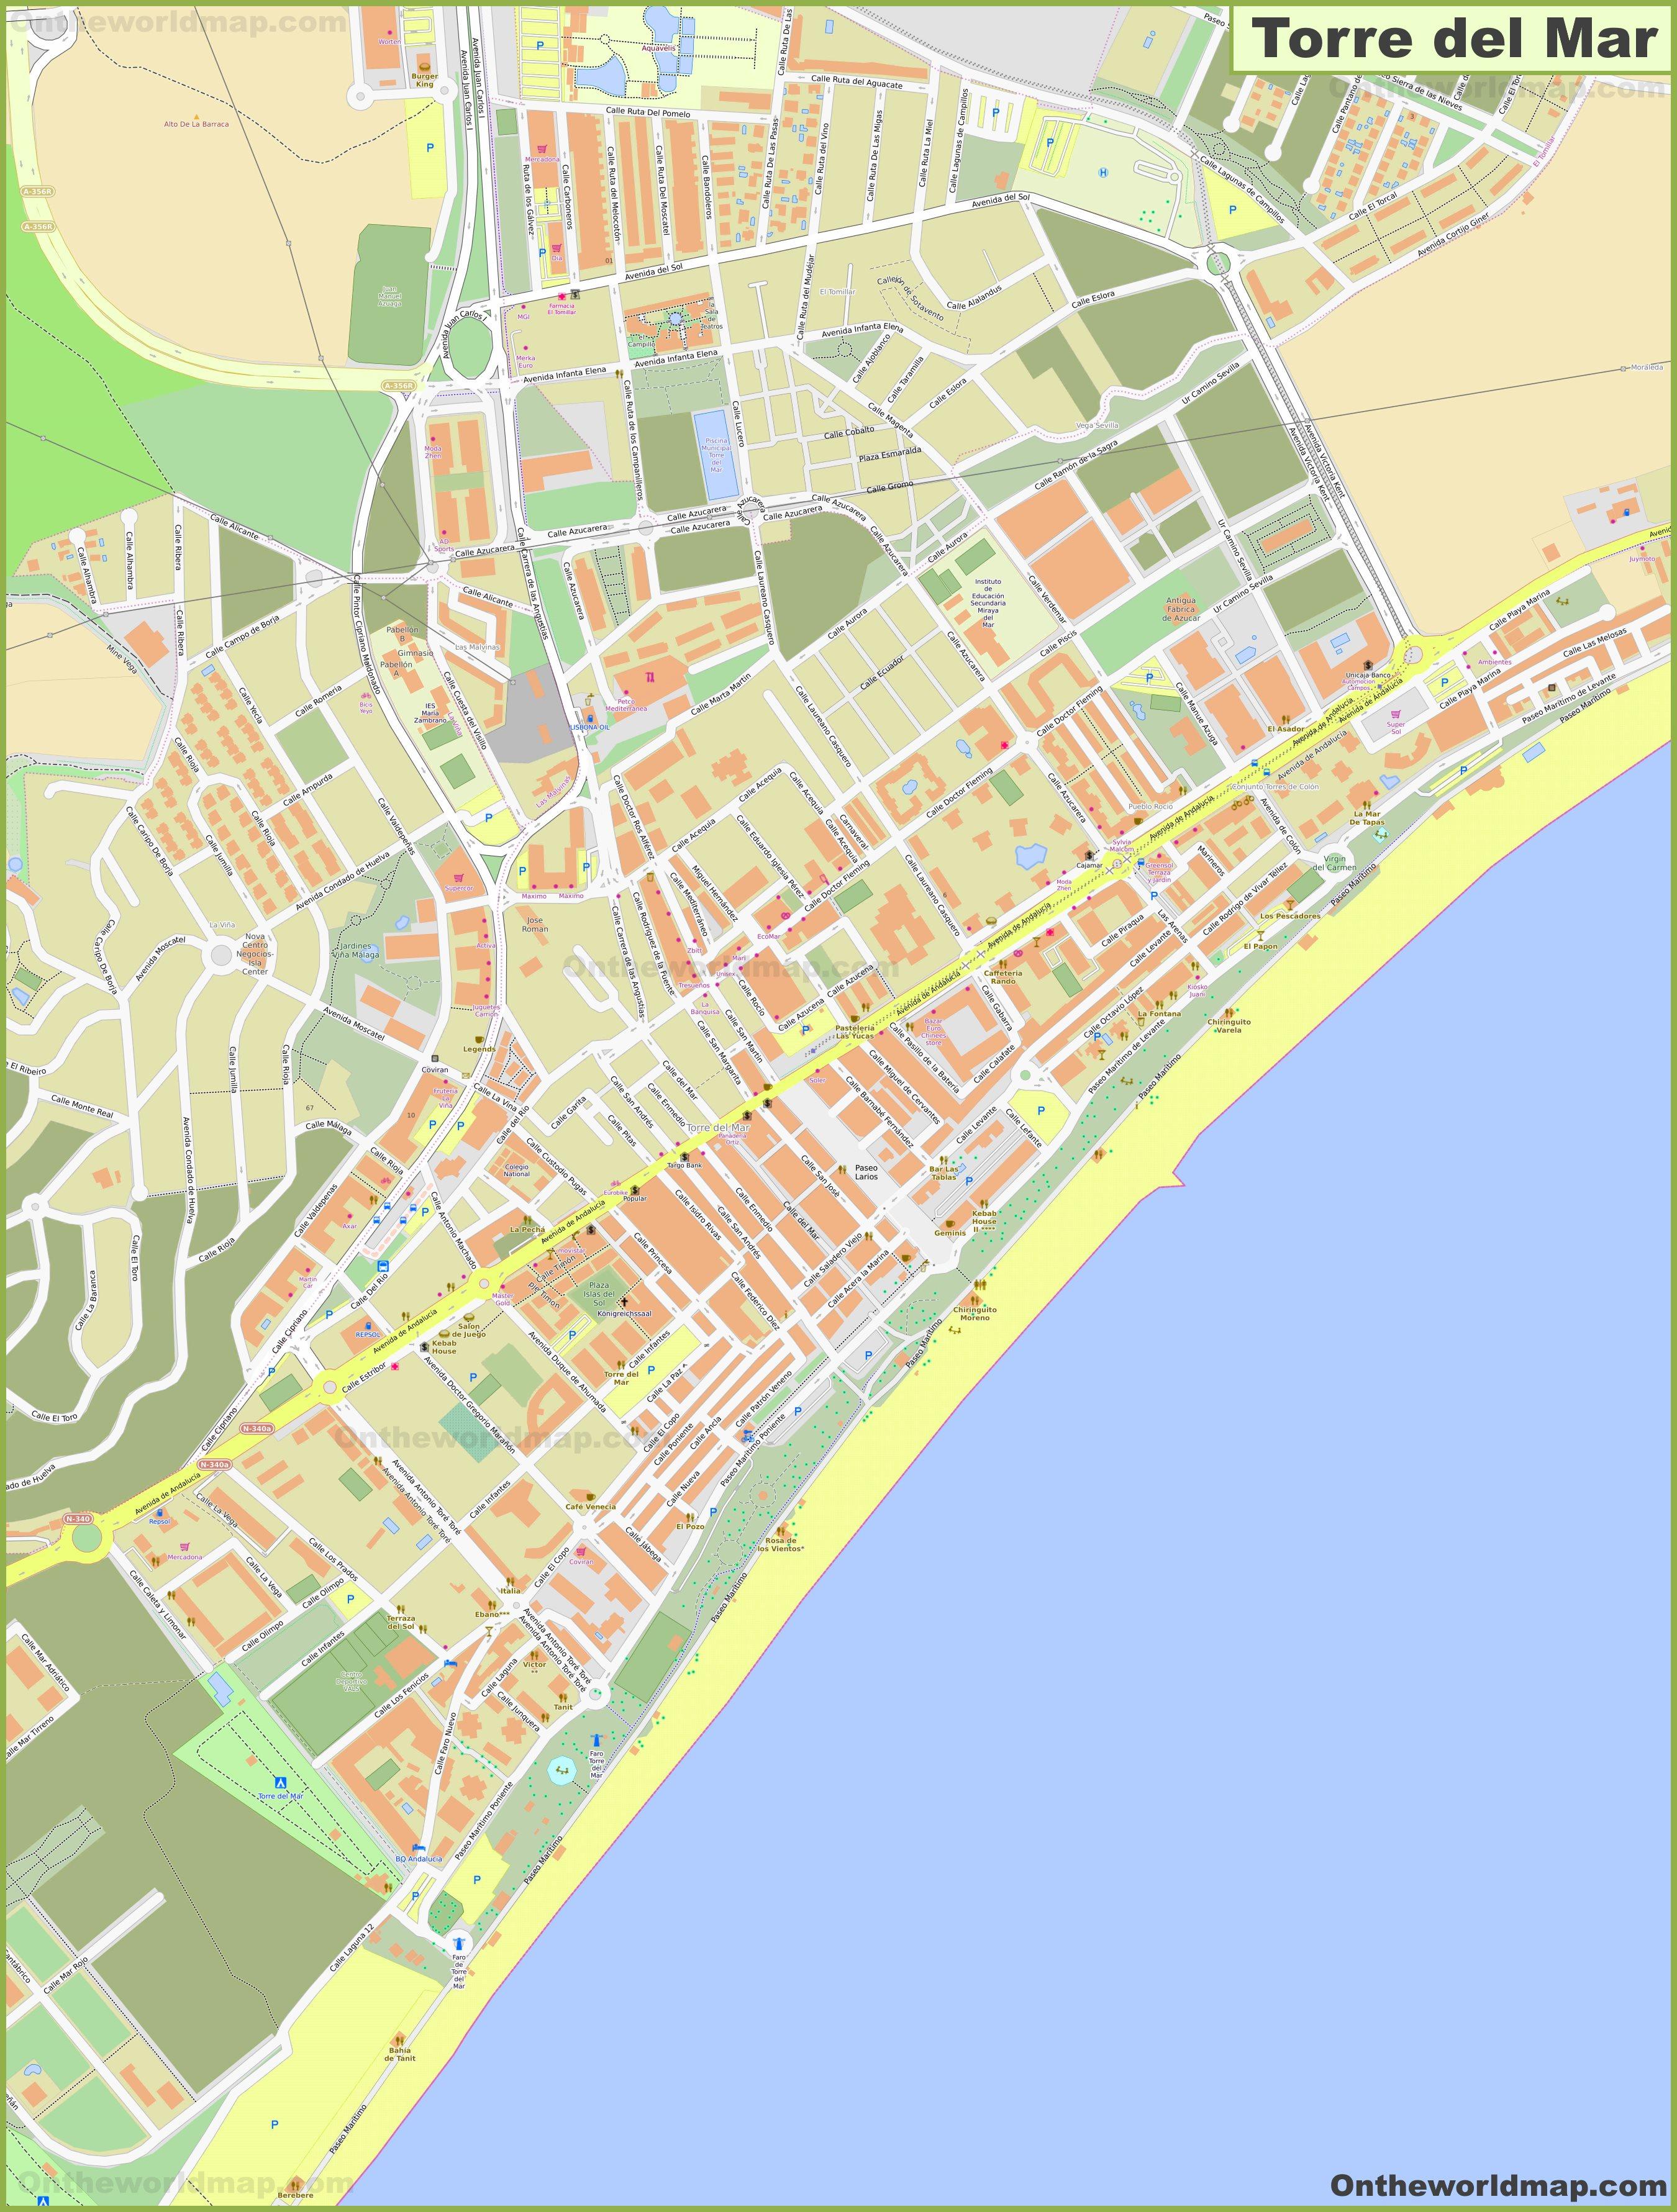 Mapa Torre Del Mar.Mapa Detallado De Torre Del Mar